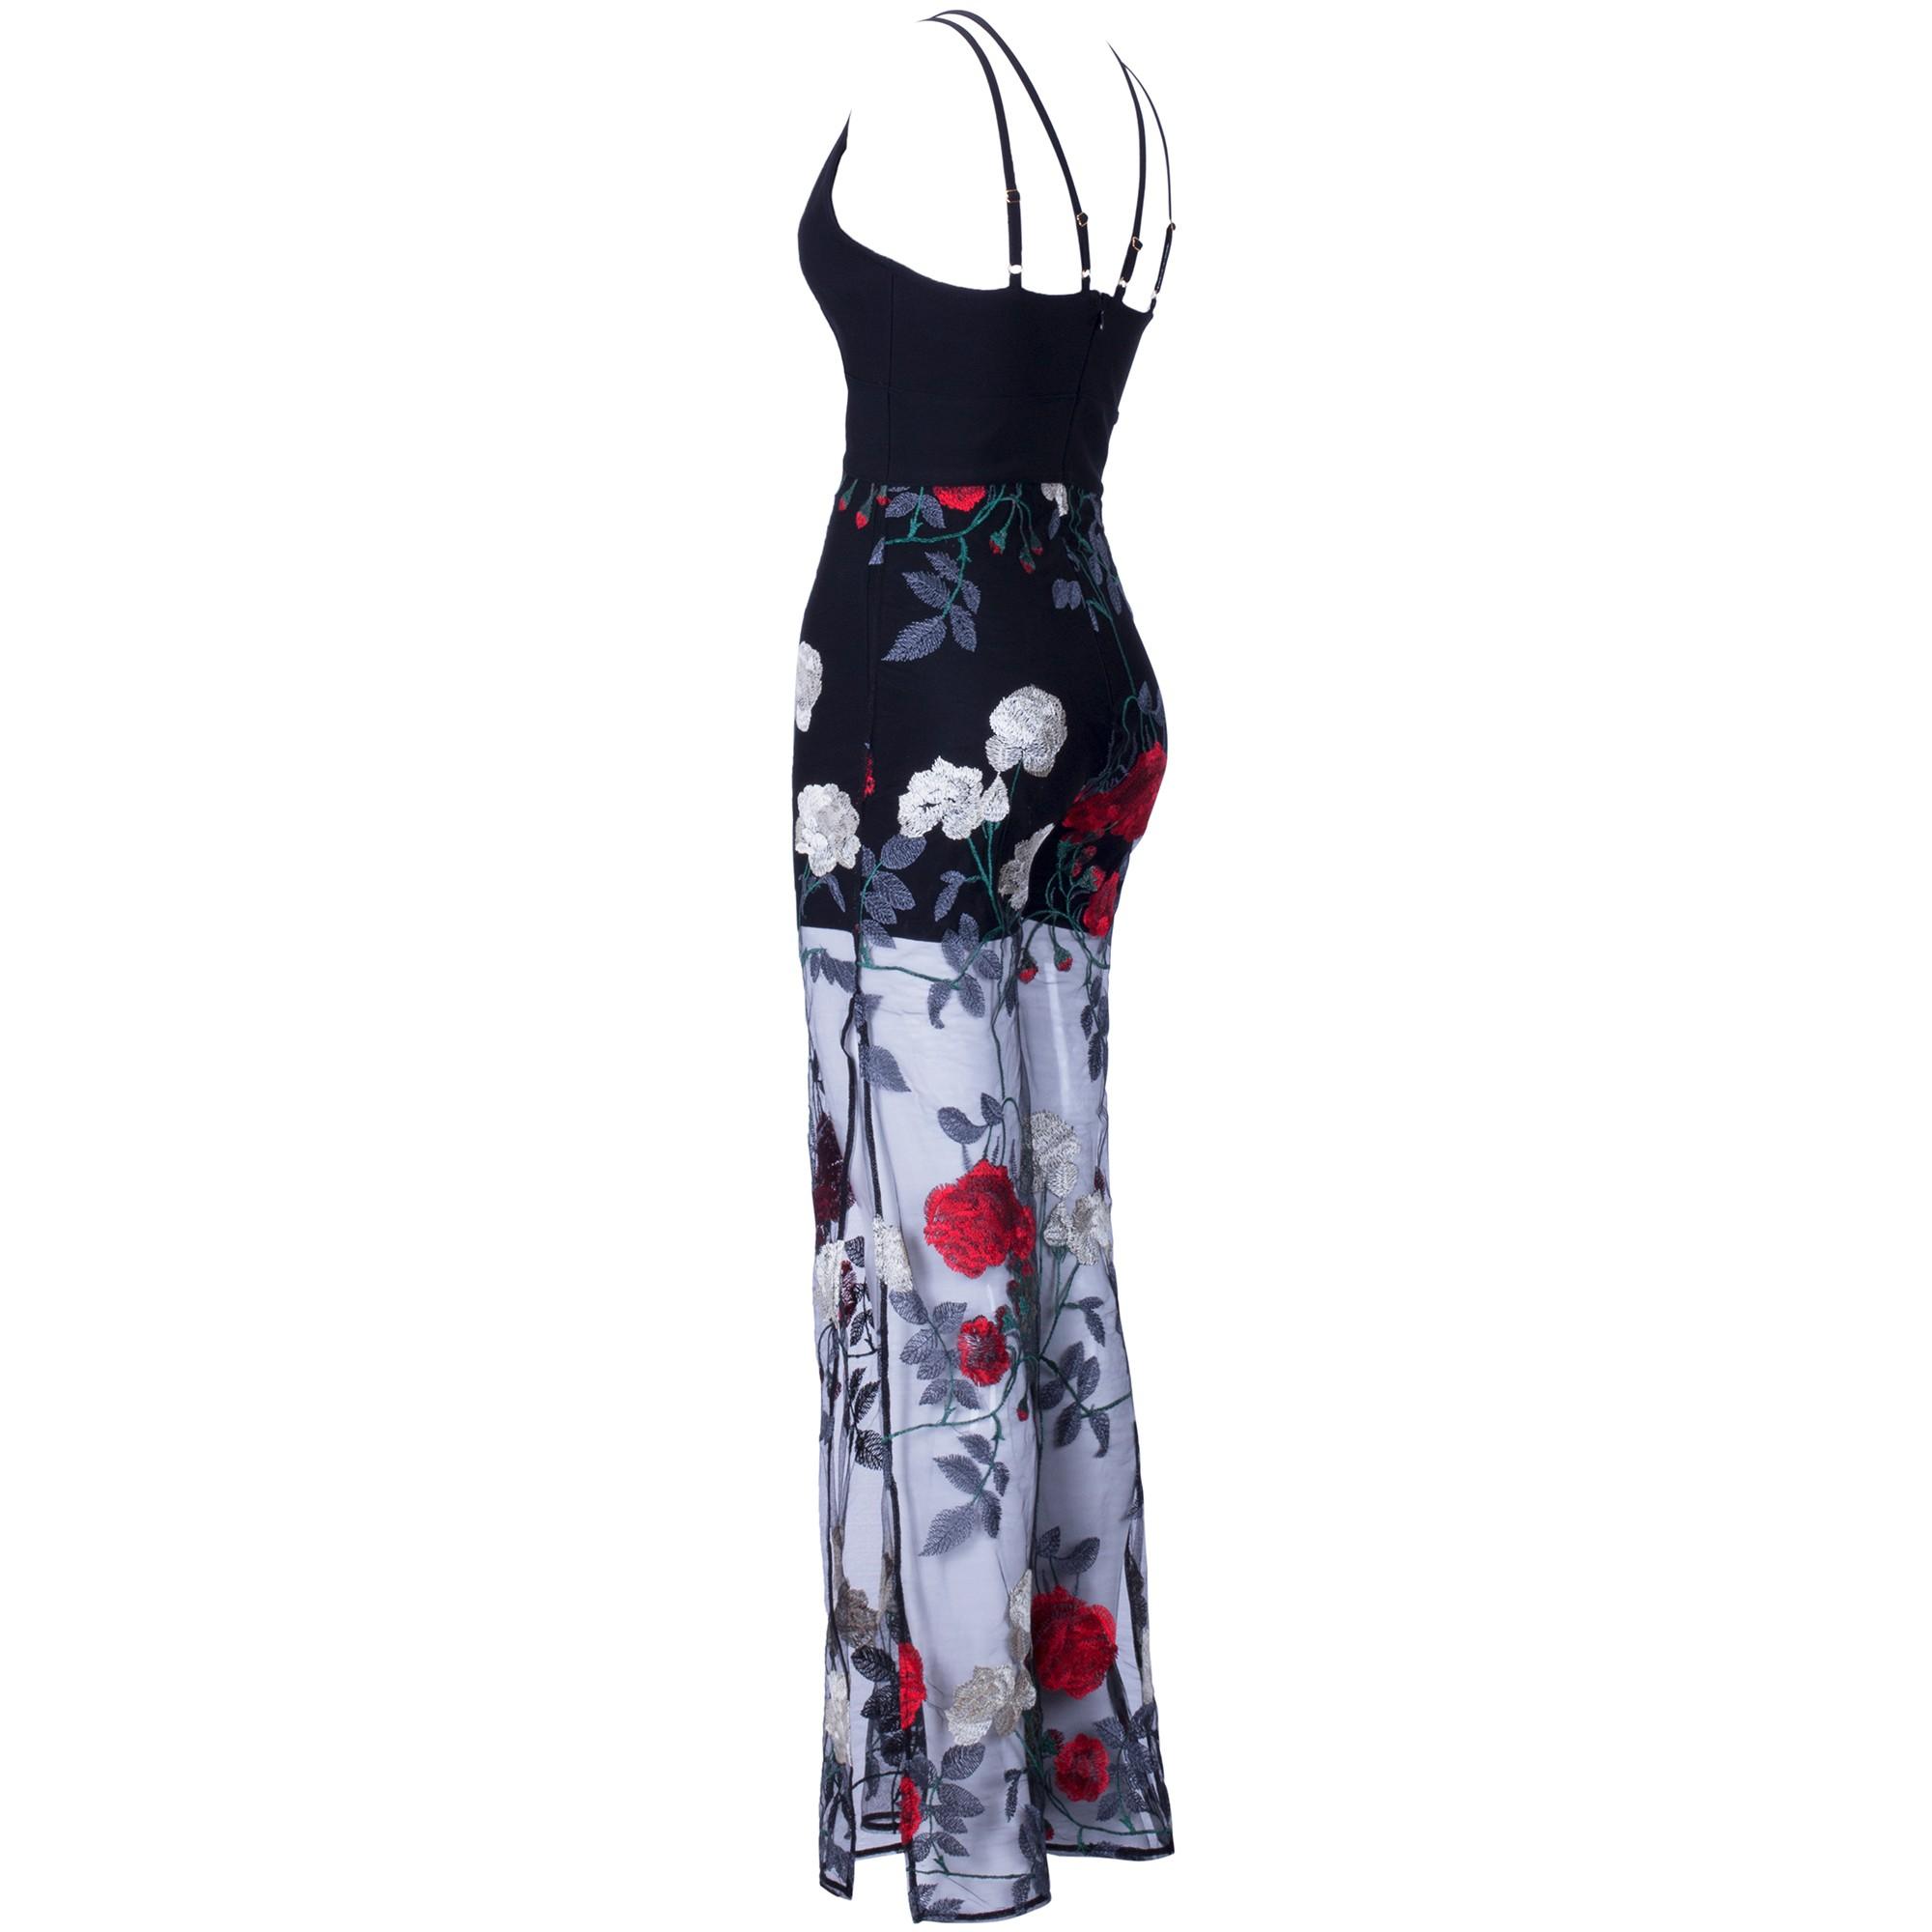 Rayon - Black V Neck Sleeveless 2 Piece Flower Mesh Pants Sexy Bandage Jumpsuit H0097-Black